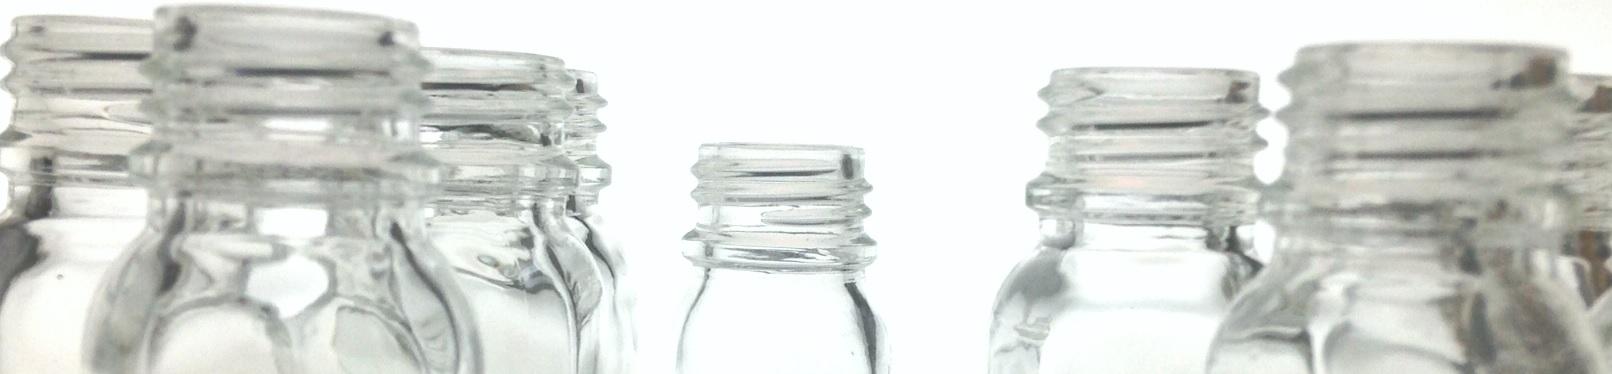 Clear glass bottles PH